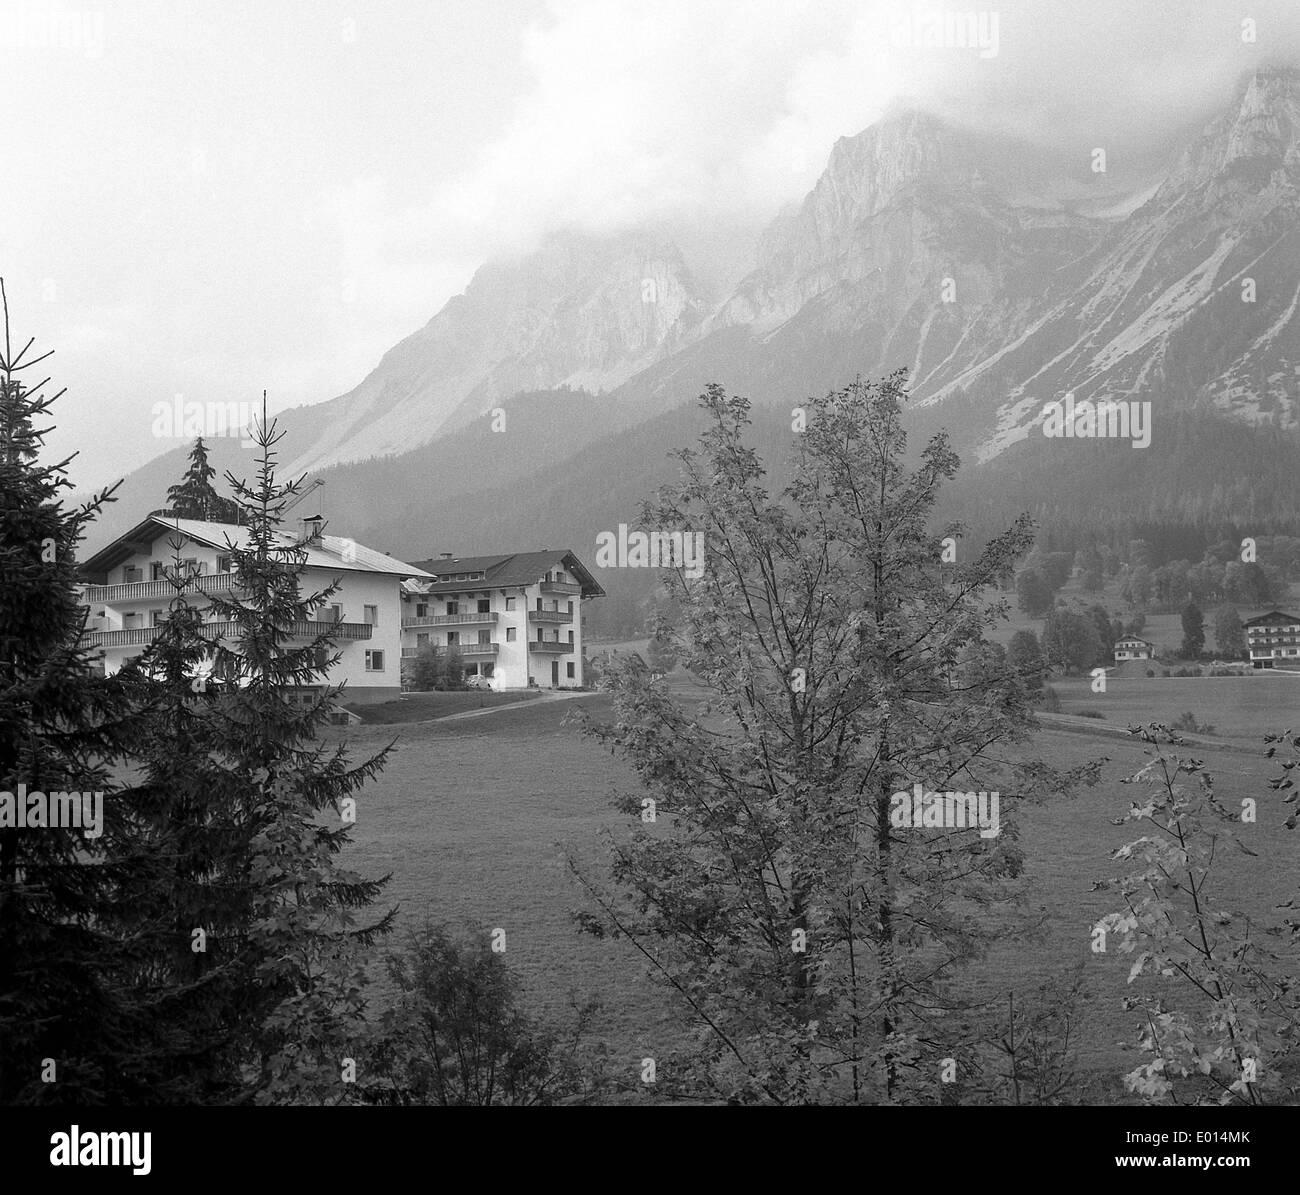 Ramsau in Styria, Austria, 1968 Stock Photo